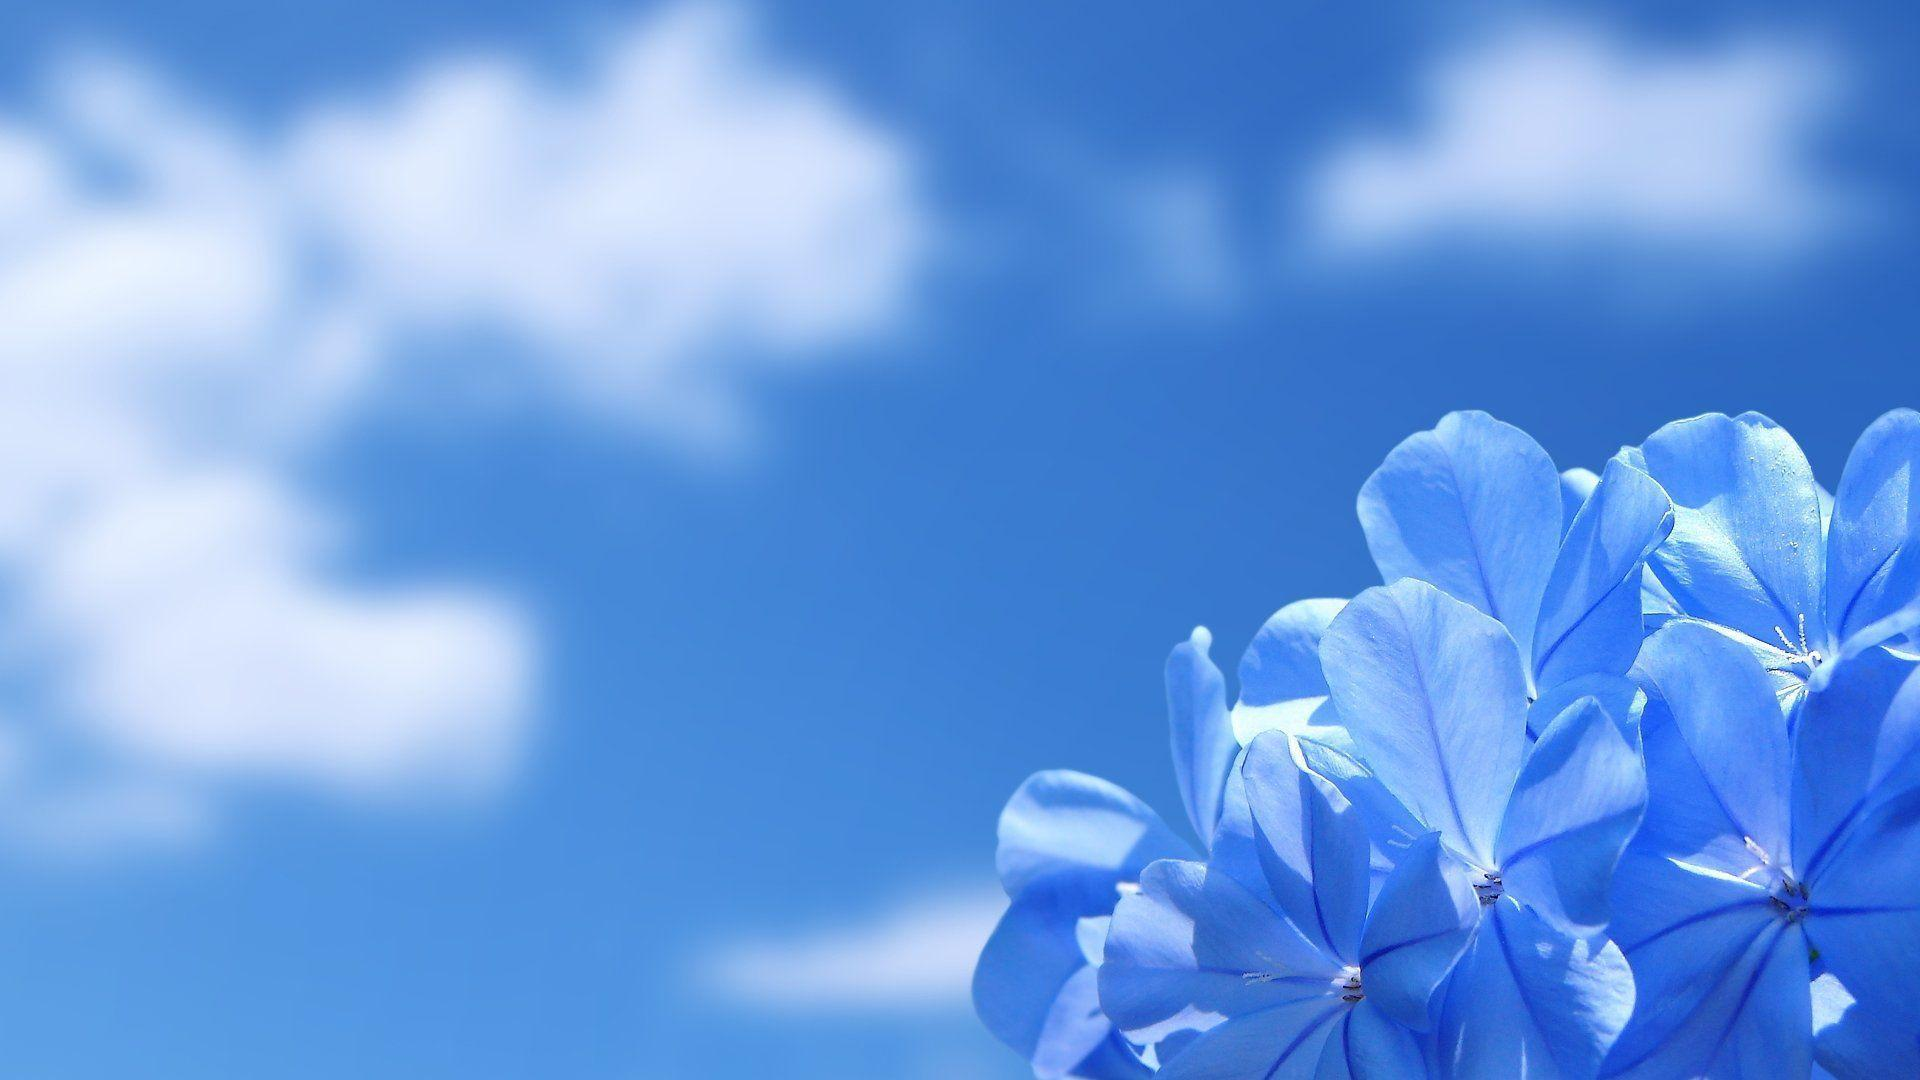 Desktop Wallpapers HD Flowers | High Definition Wallpapers